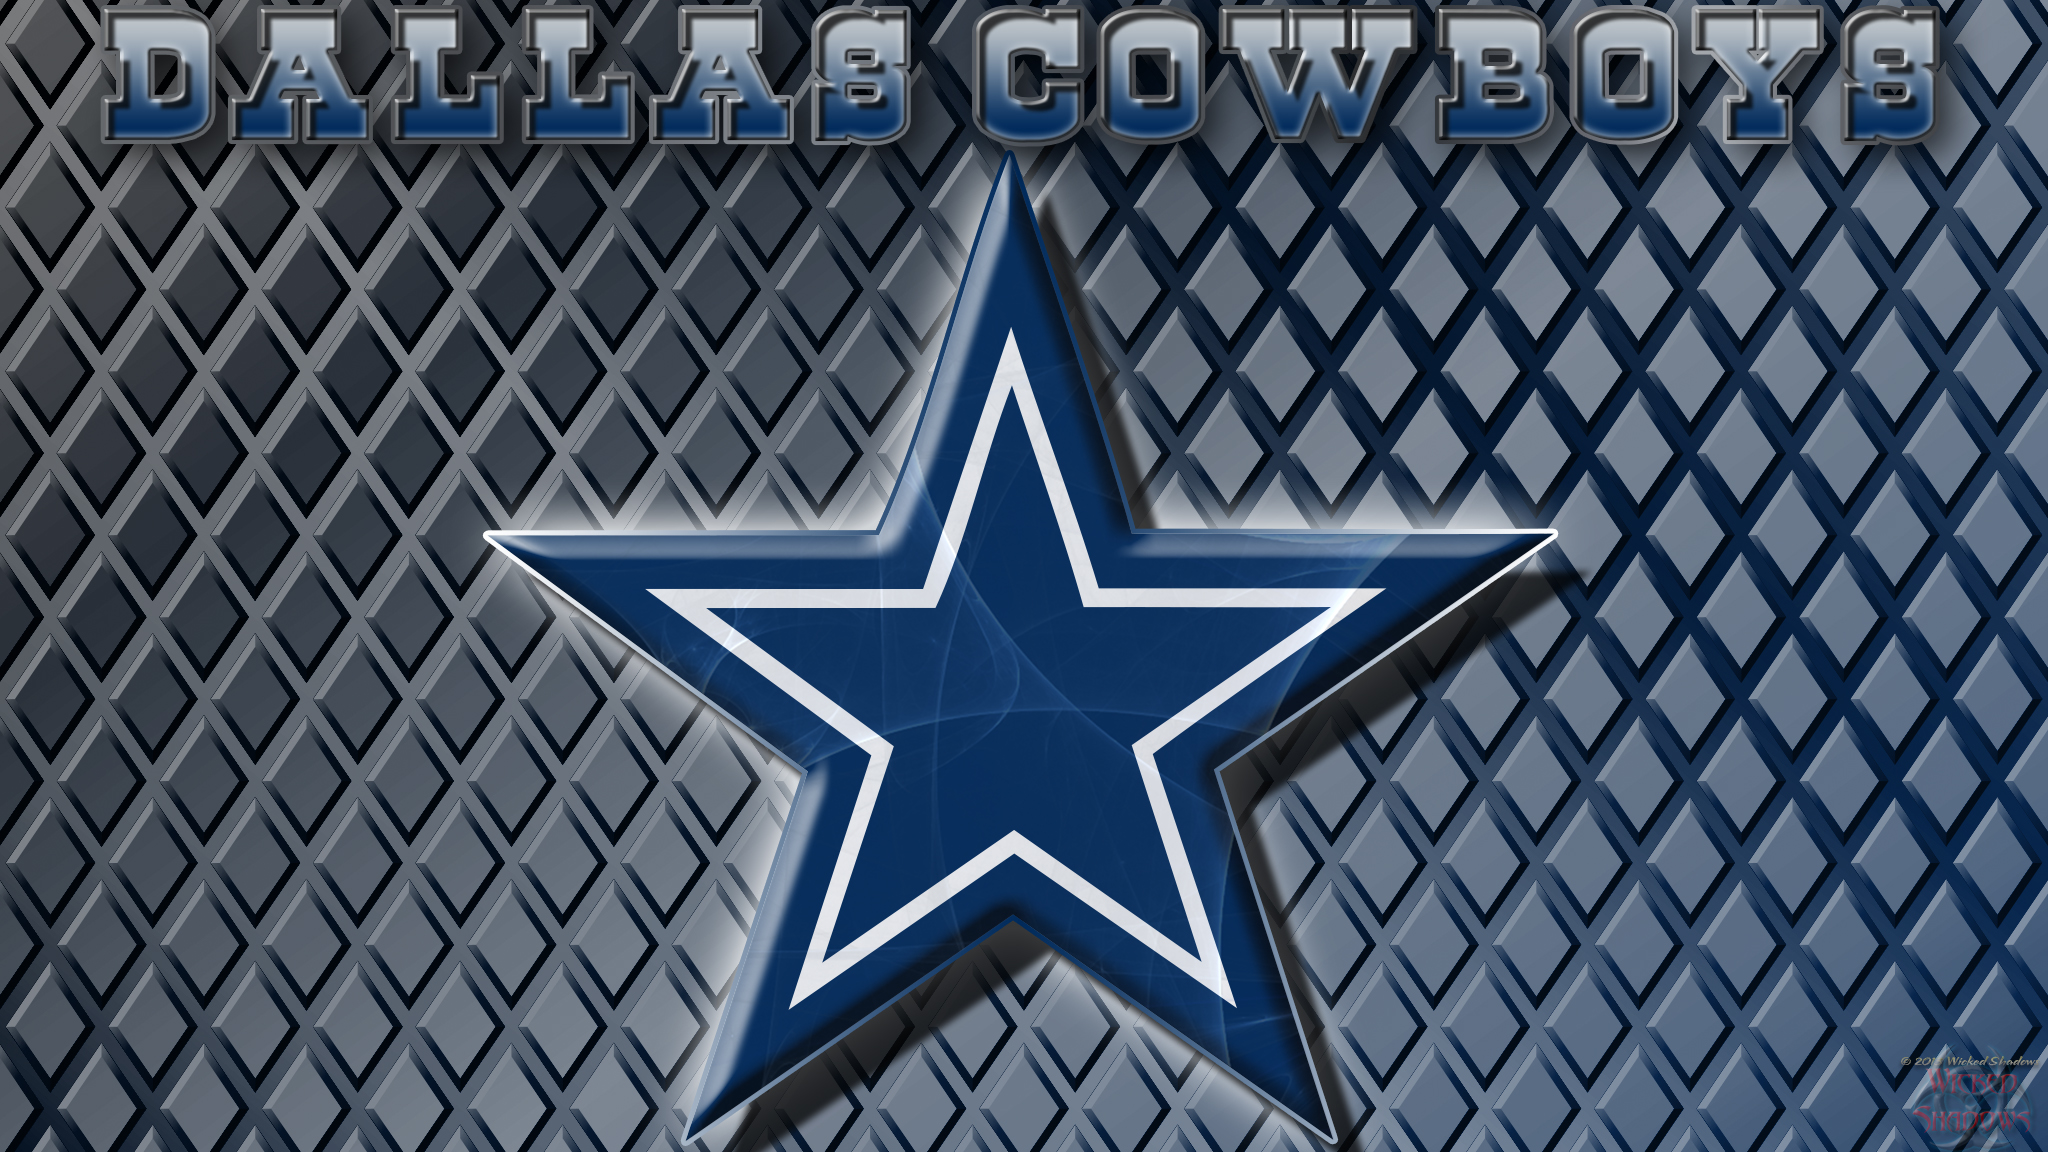 Wallpapers By Wicked Shadows Dallas Cowboys Logo Wallpaper 2048x1152